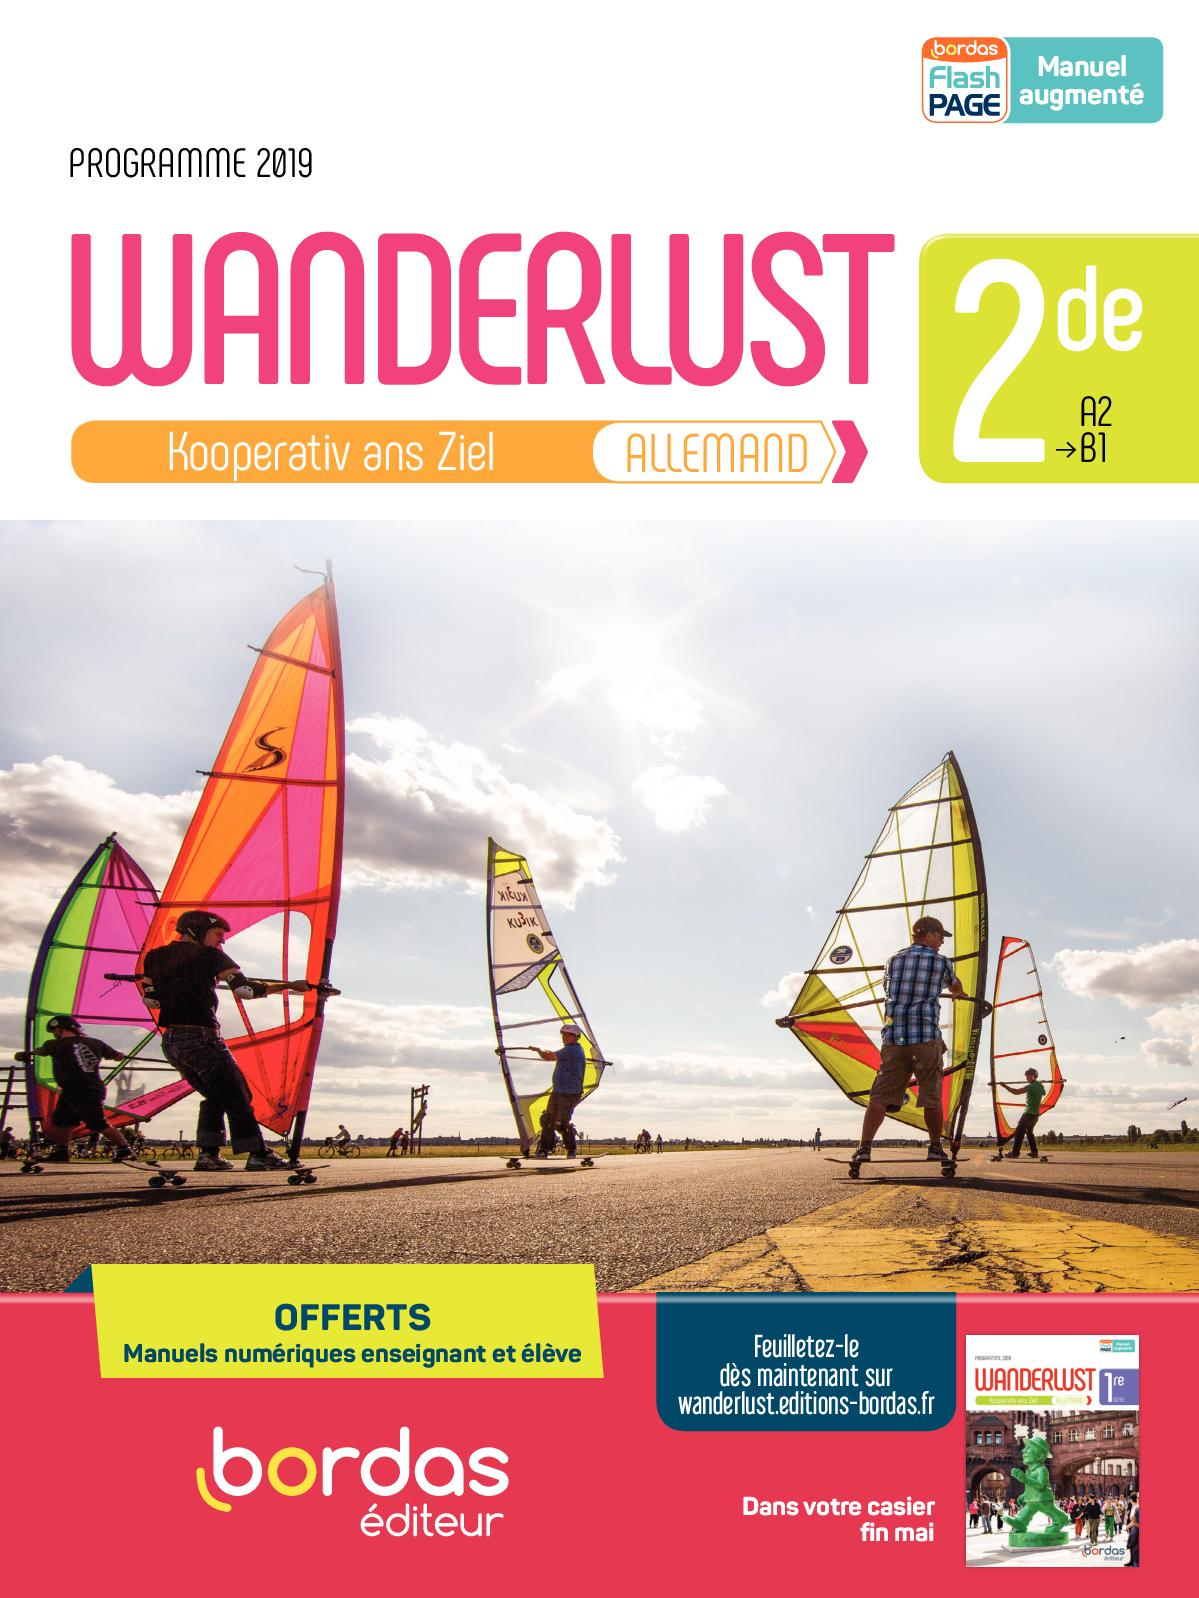 Calaméo - Wanderlust 2de